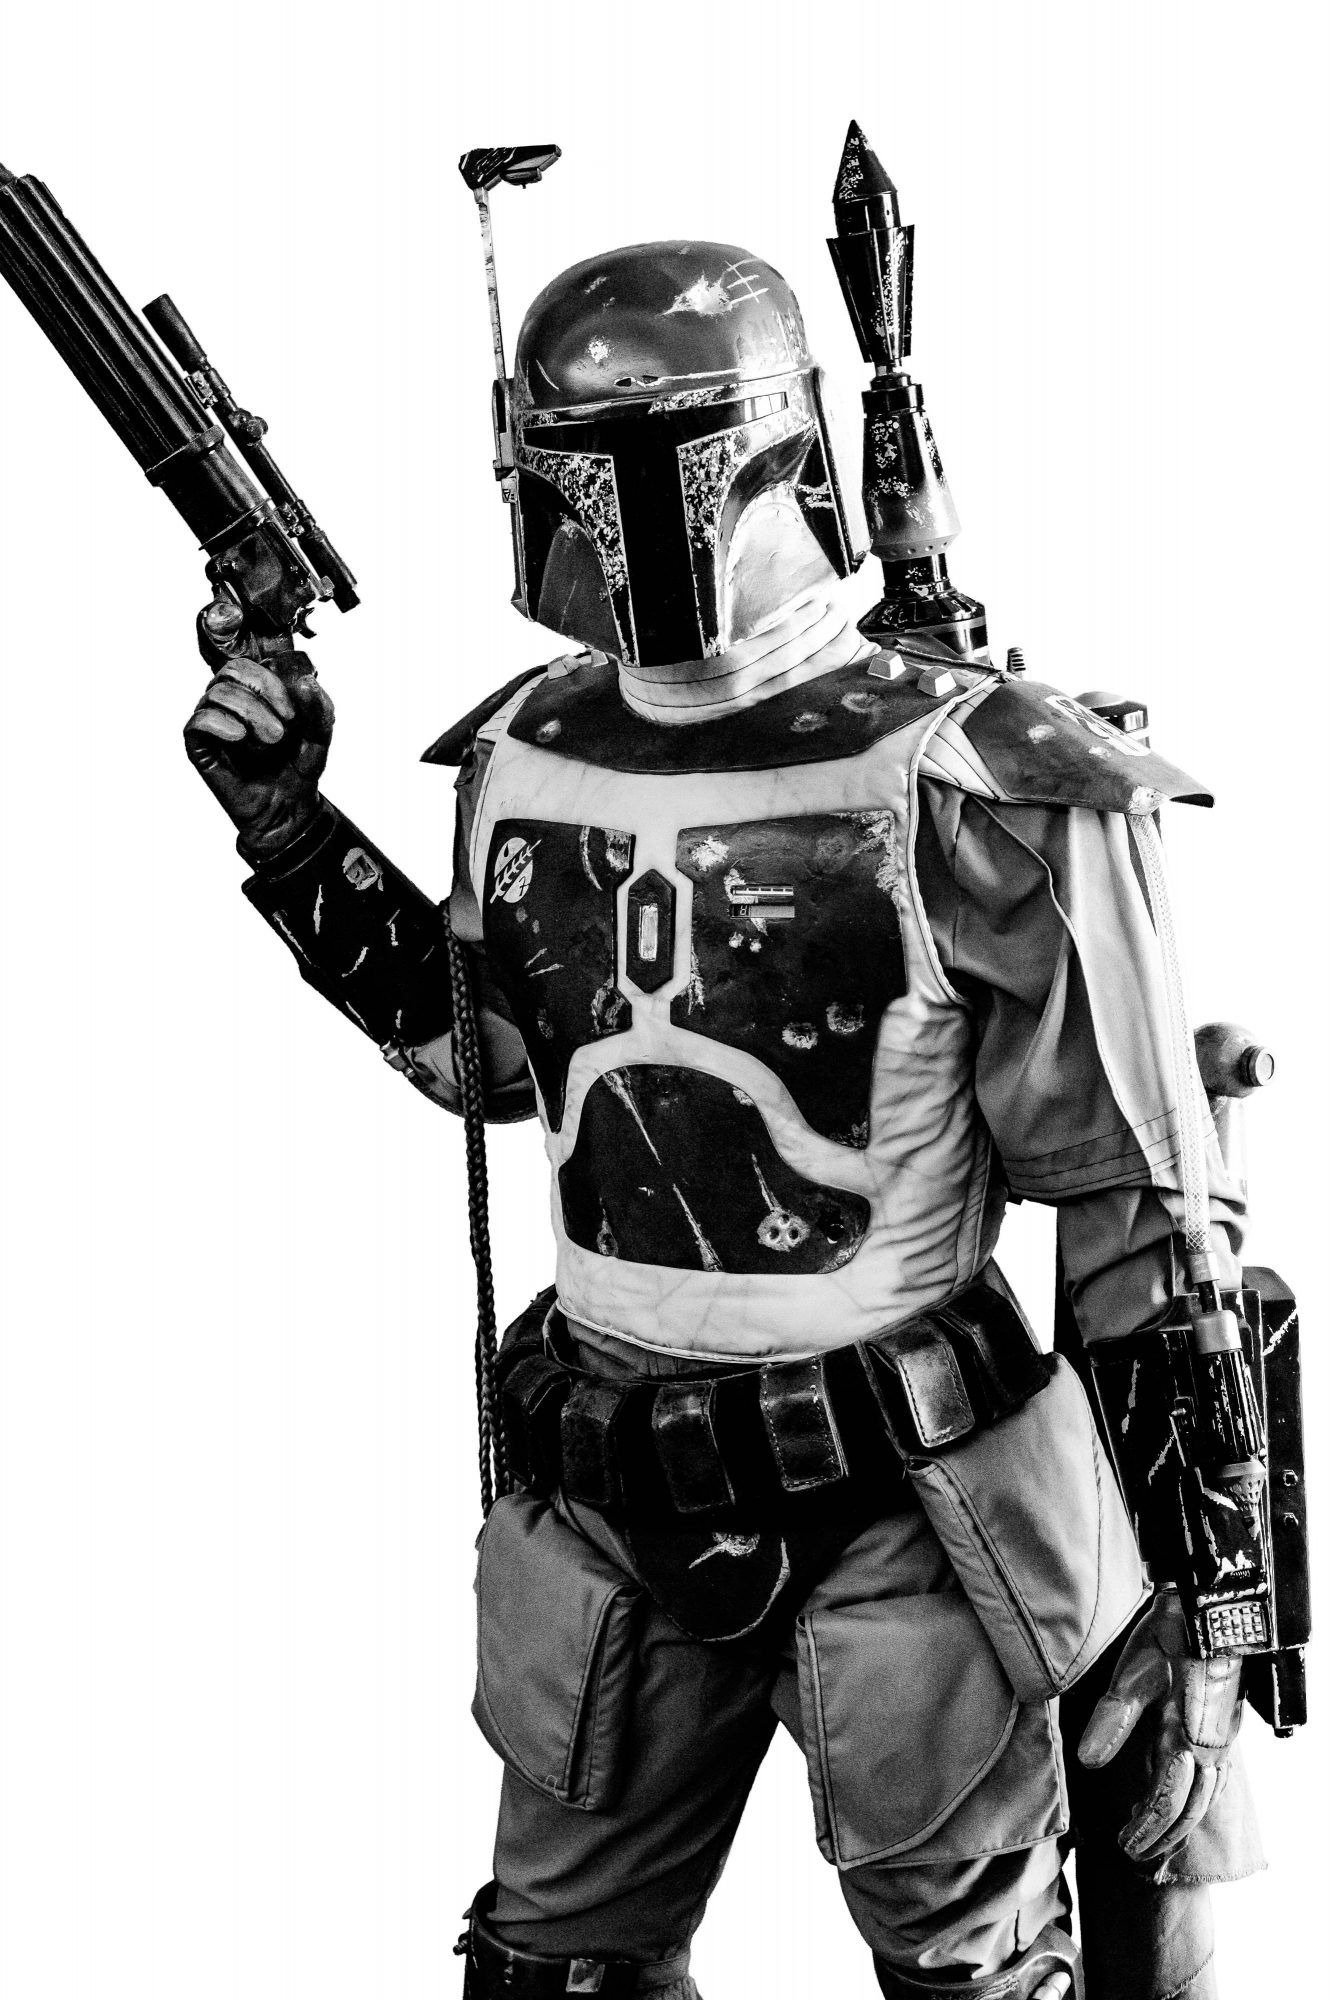 Leica M10 and Star Wars - Boba Fett - photo by Jay Goodrich